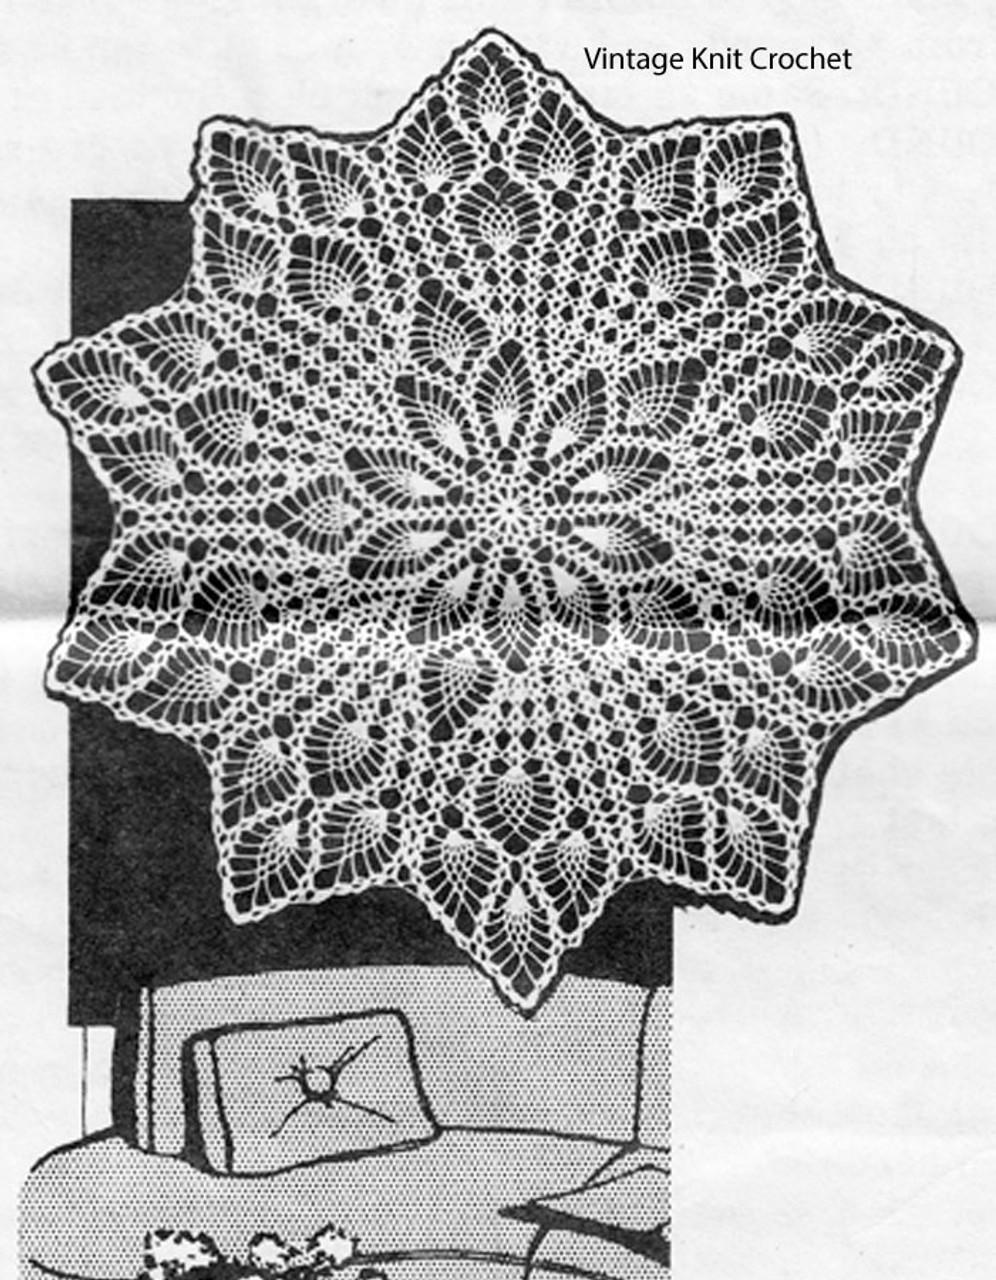 Crochet Pineapple Centerpiece Doily Pattern Design 619